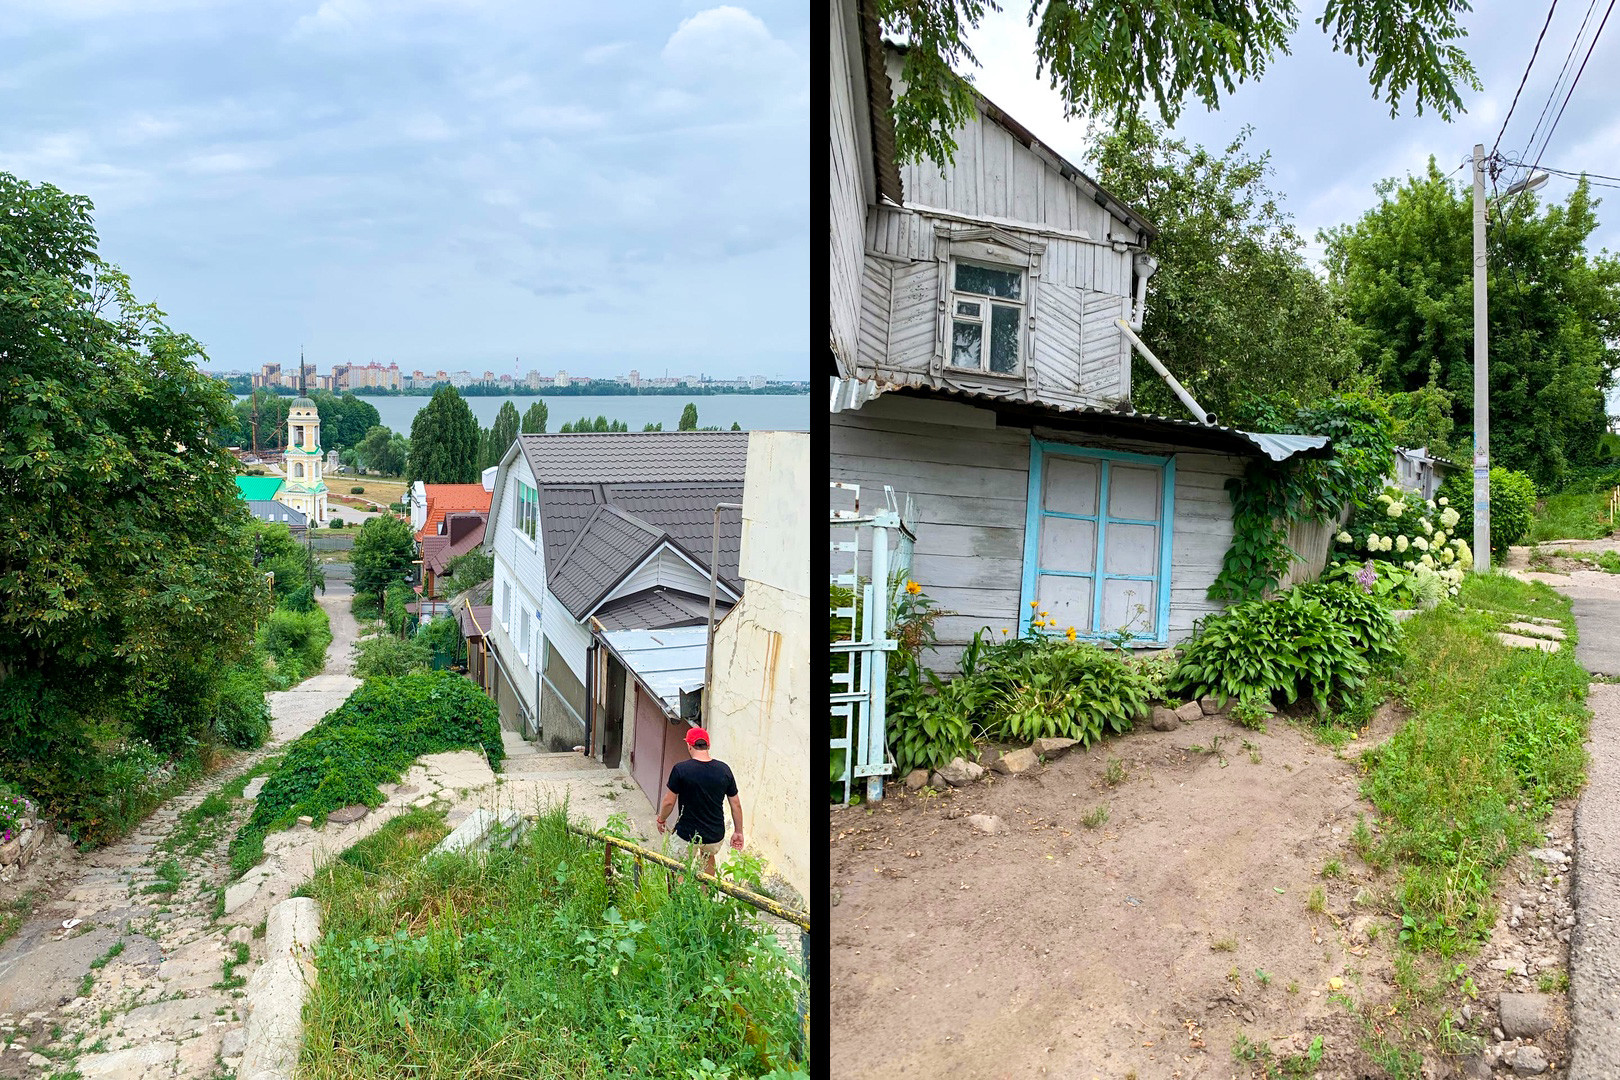 Straßen auf dem Weg zum Fluss Woronesch.